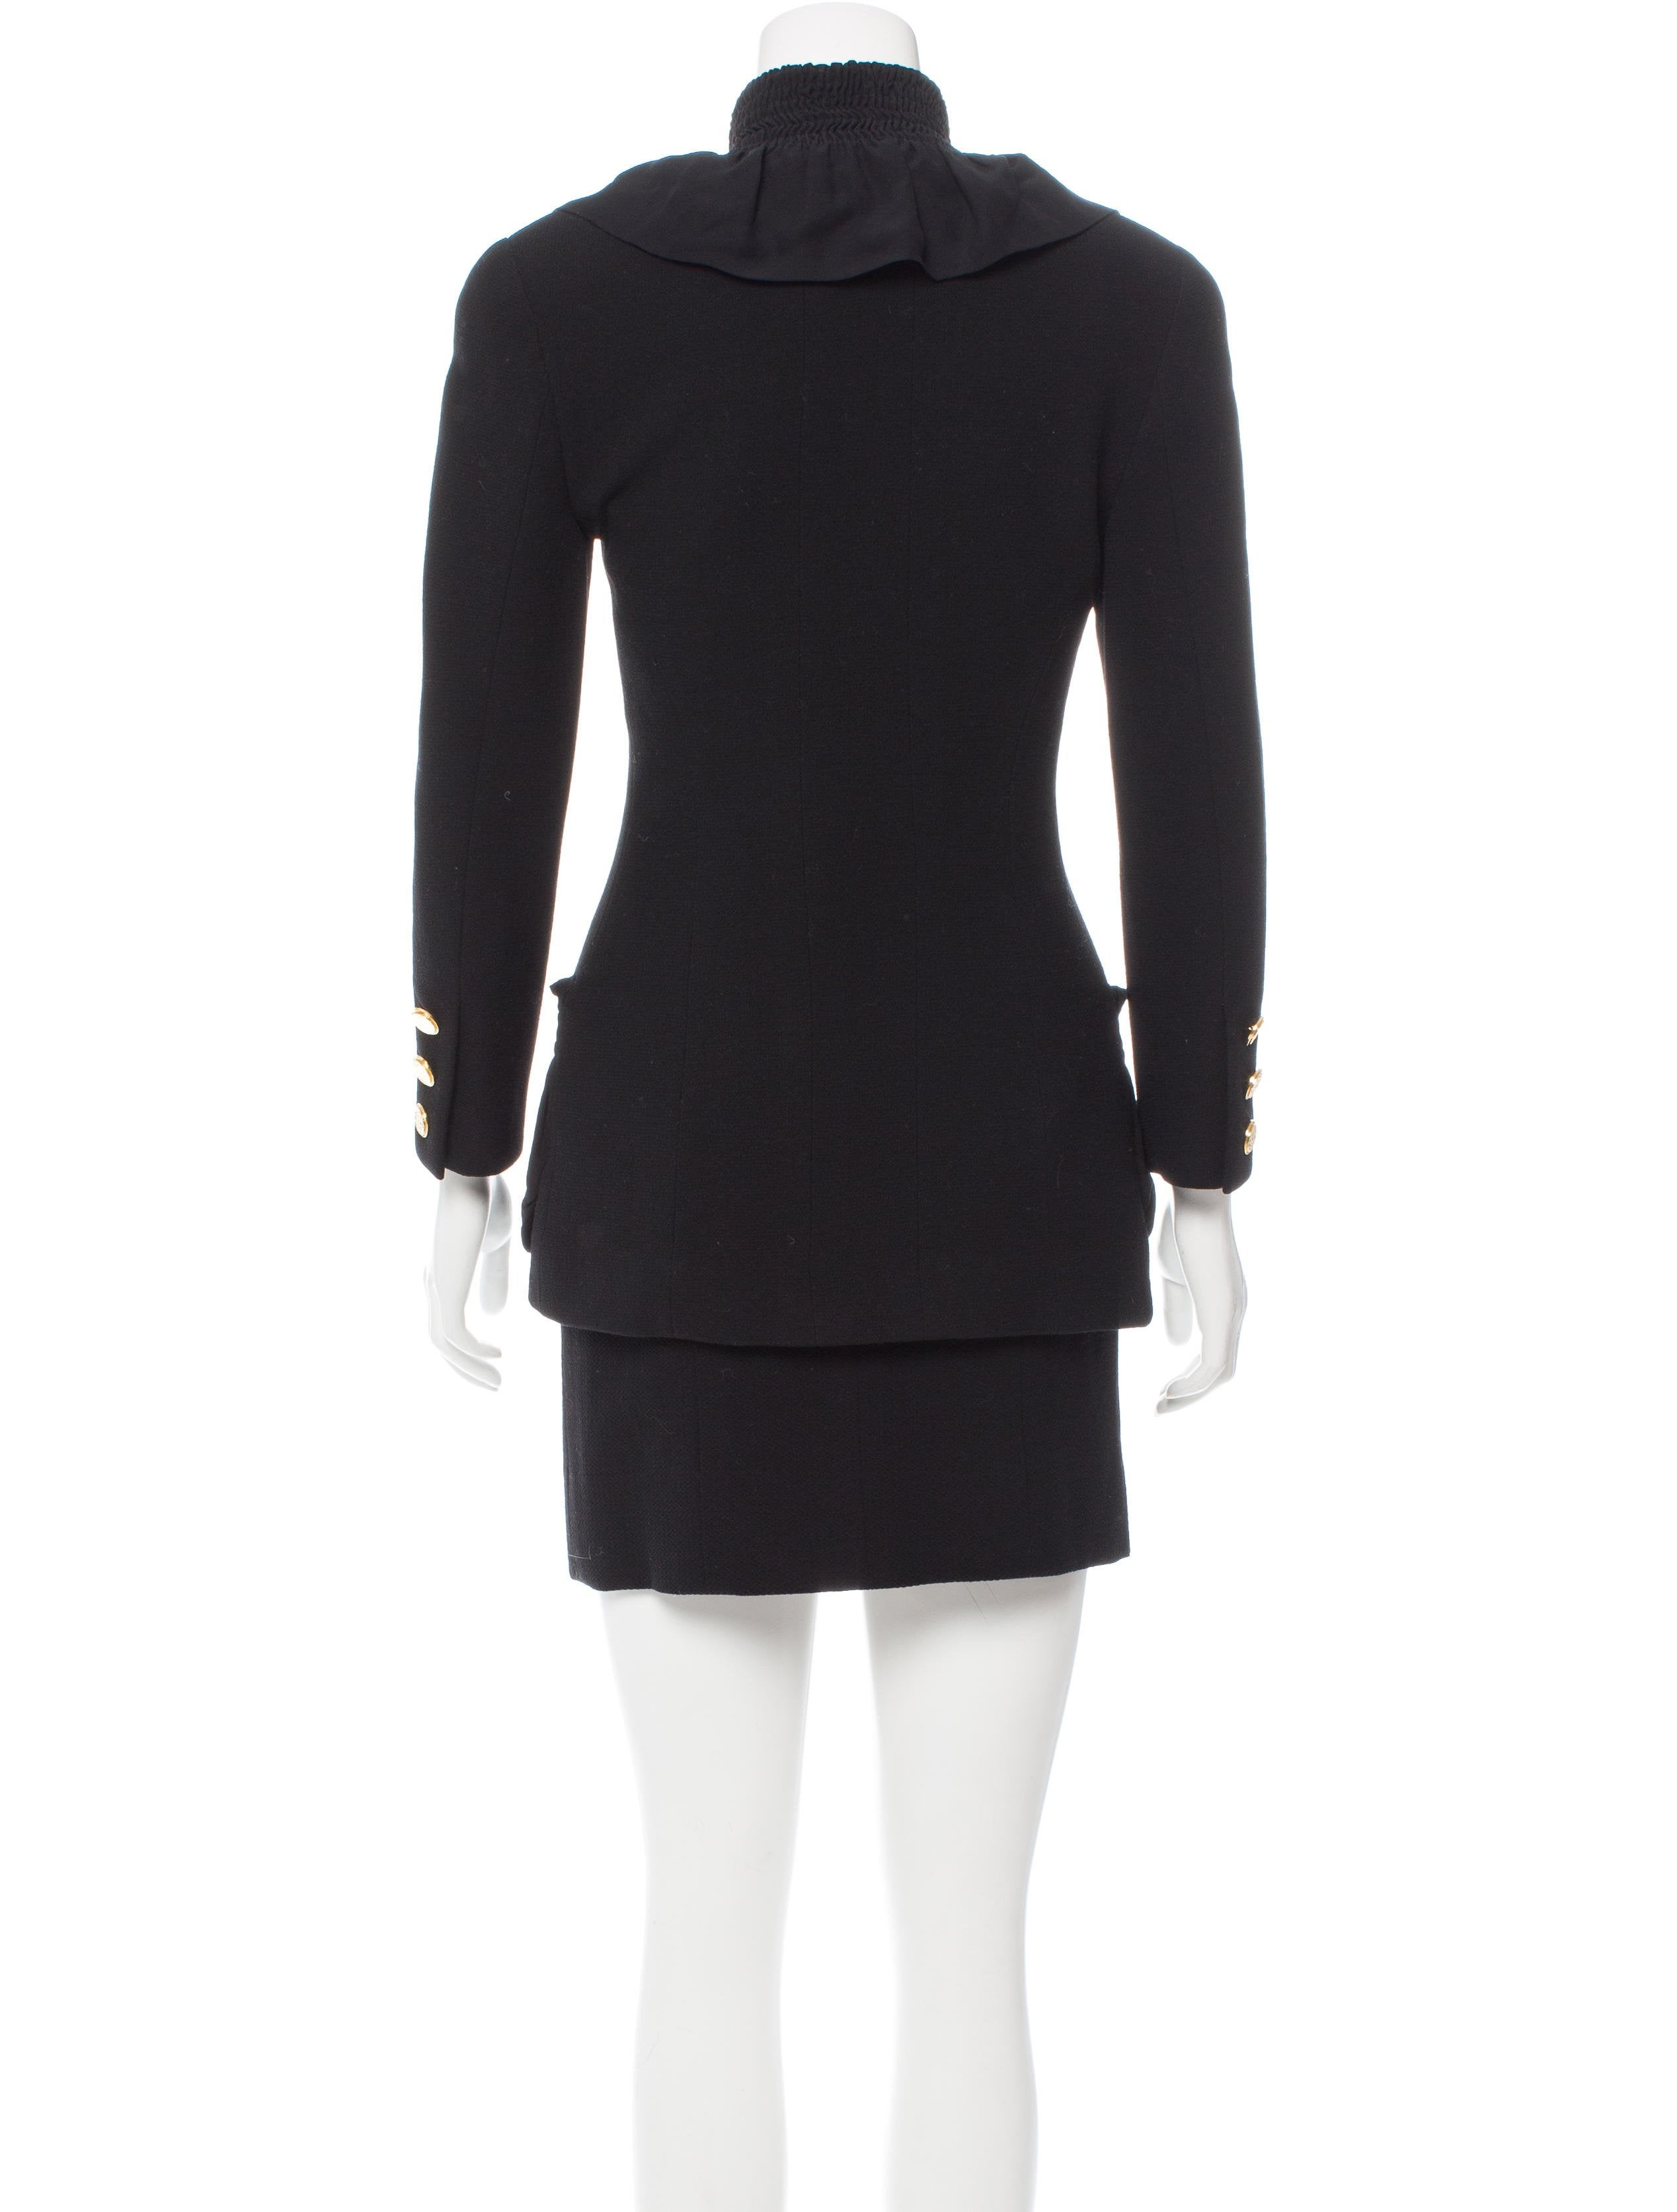 Chanel Gathered Mini Skirt Suit Clothing Cha174211